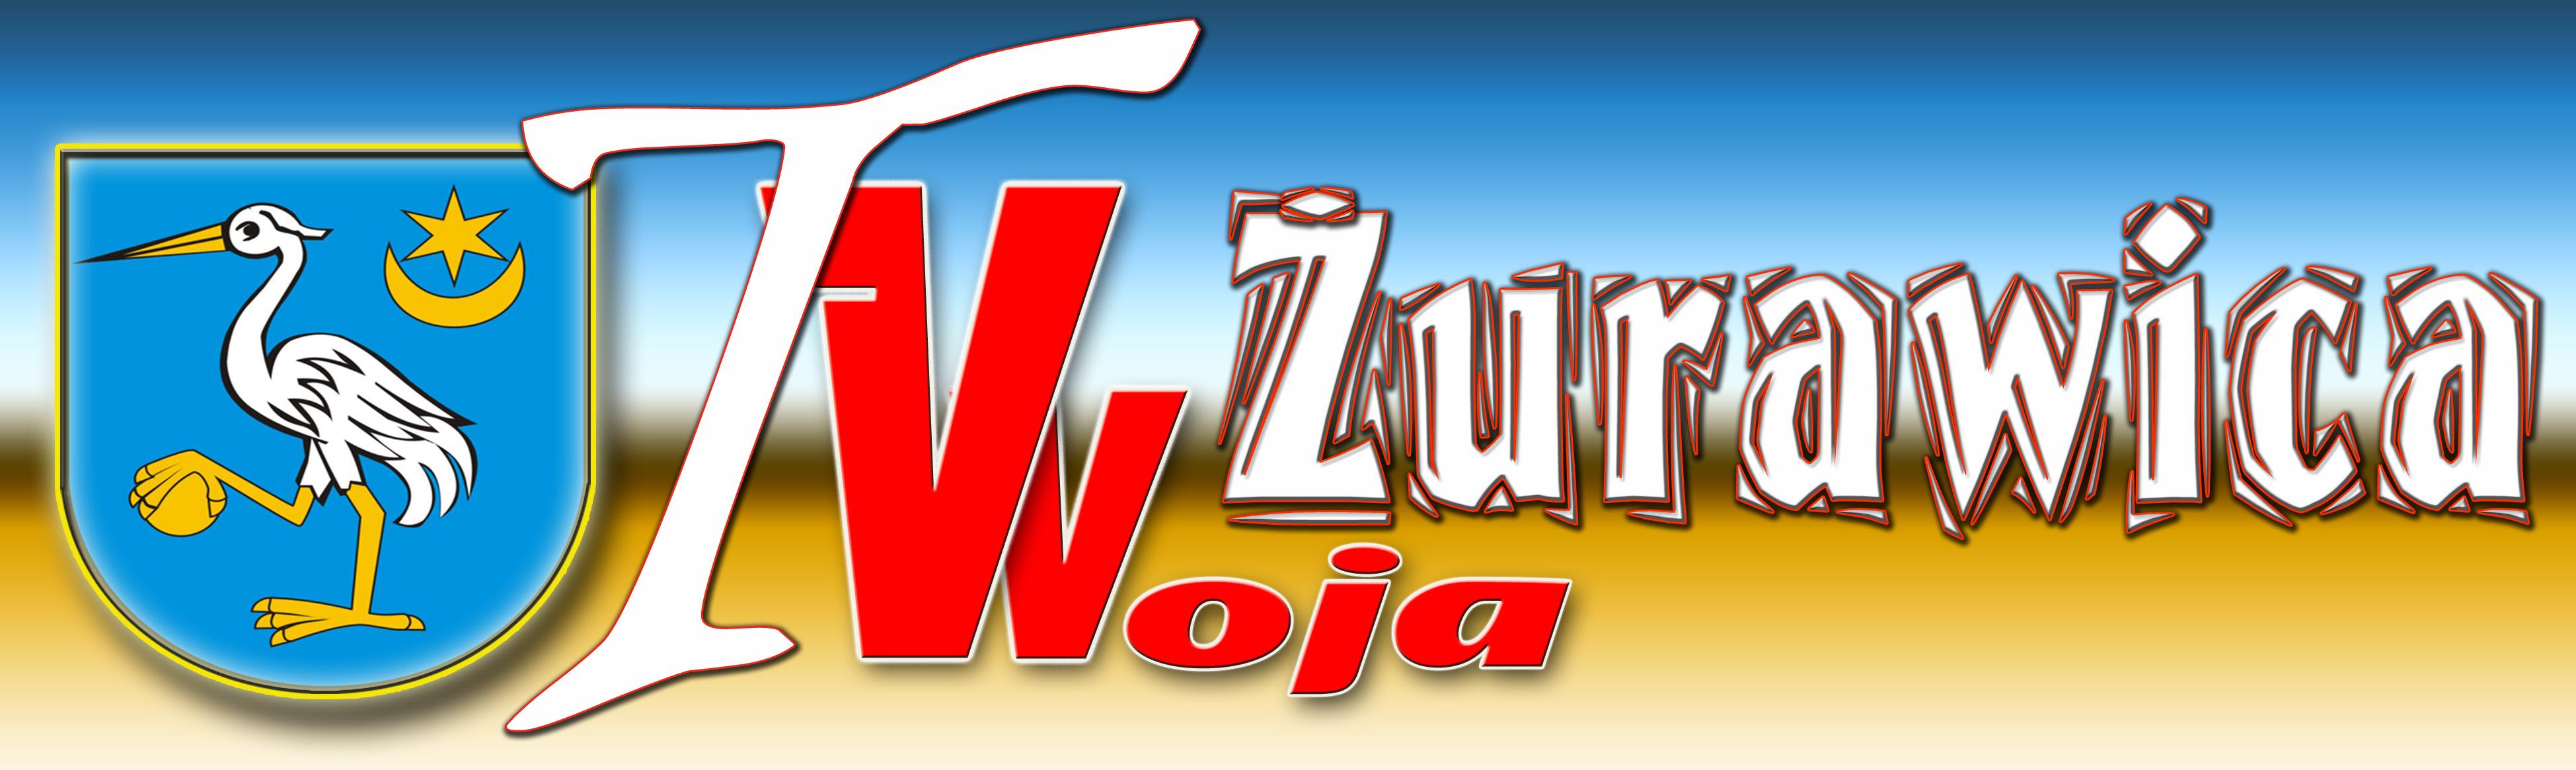 TVvoja Żurawica